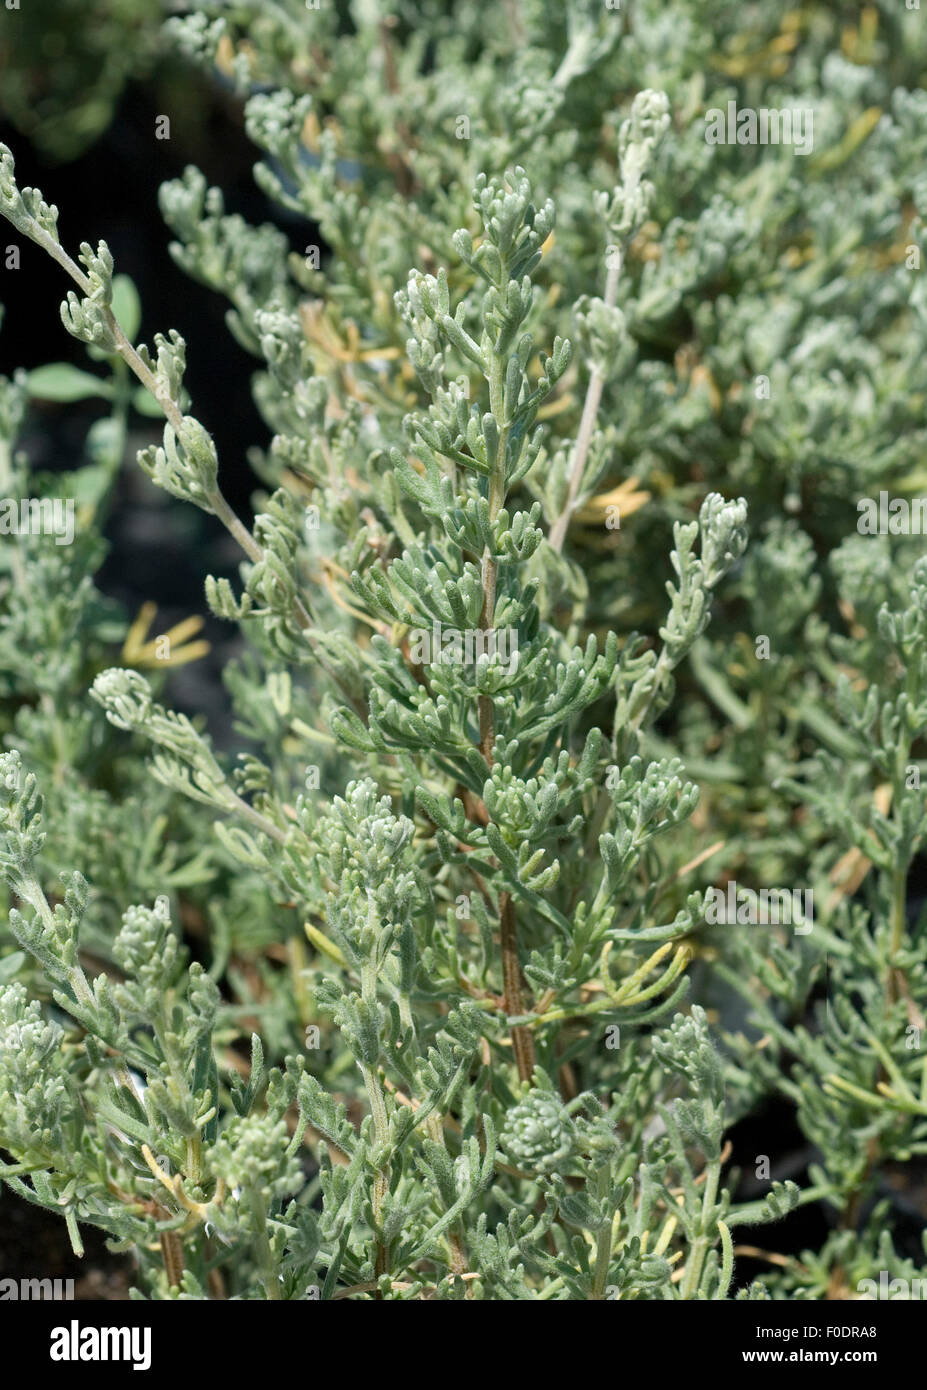 Anti-Mueckenpflanze; afrikanischer Rosmarin; Eriocephalus africanus, Heilpflanzen, - Stock Image